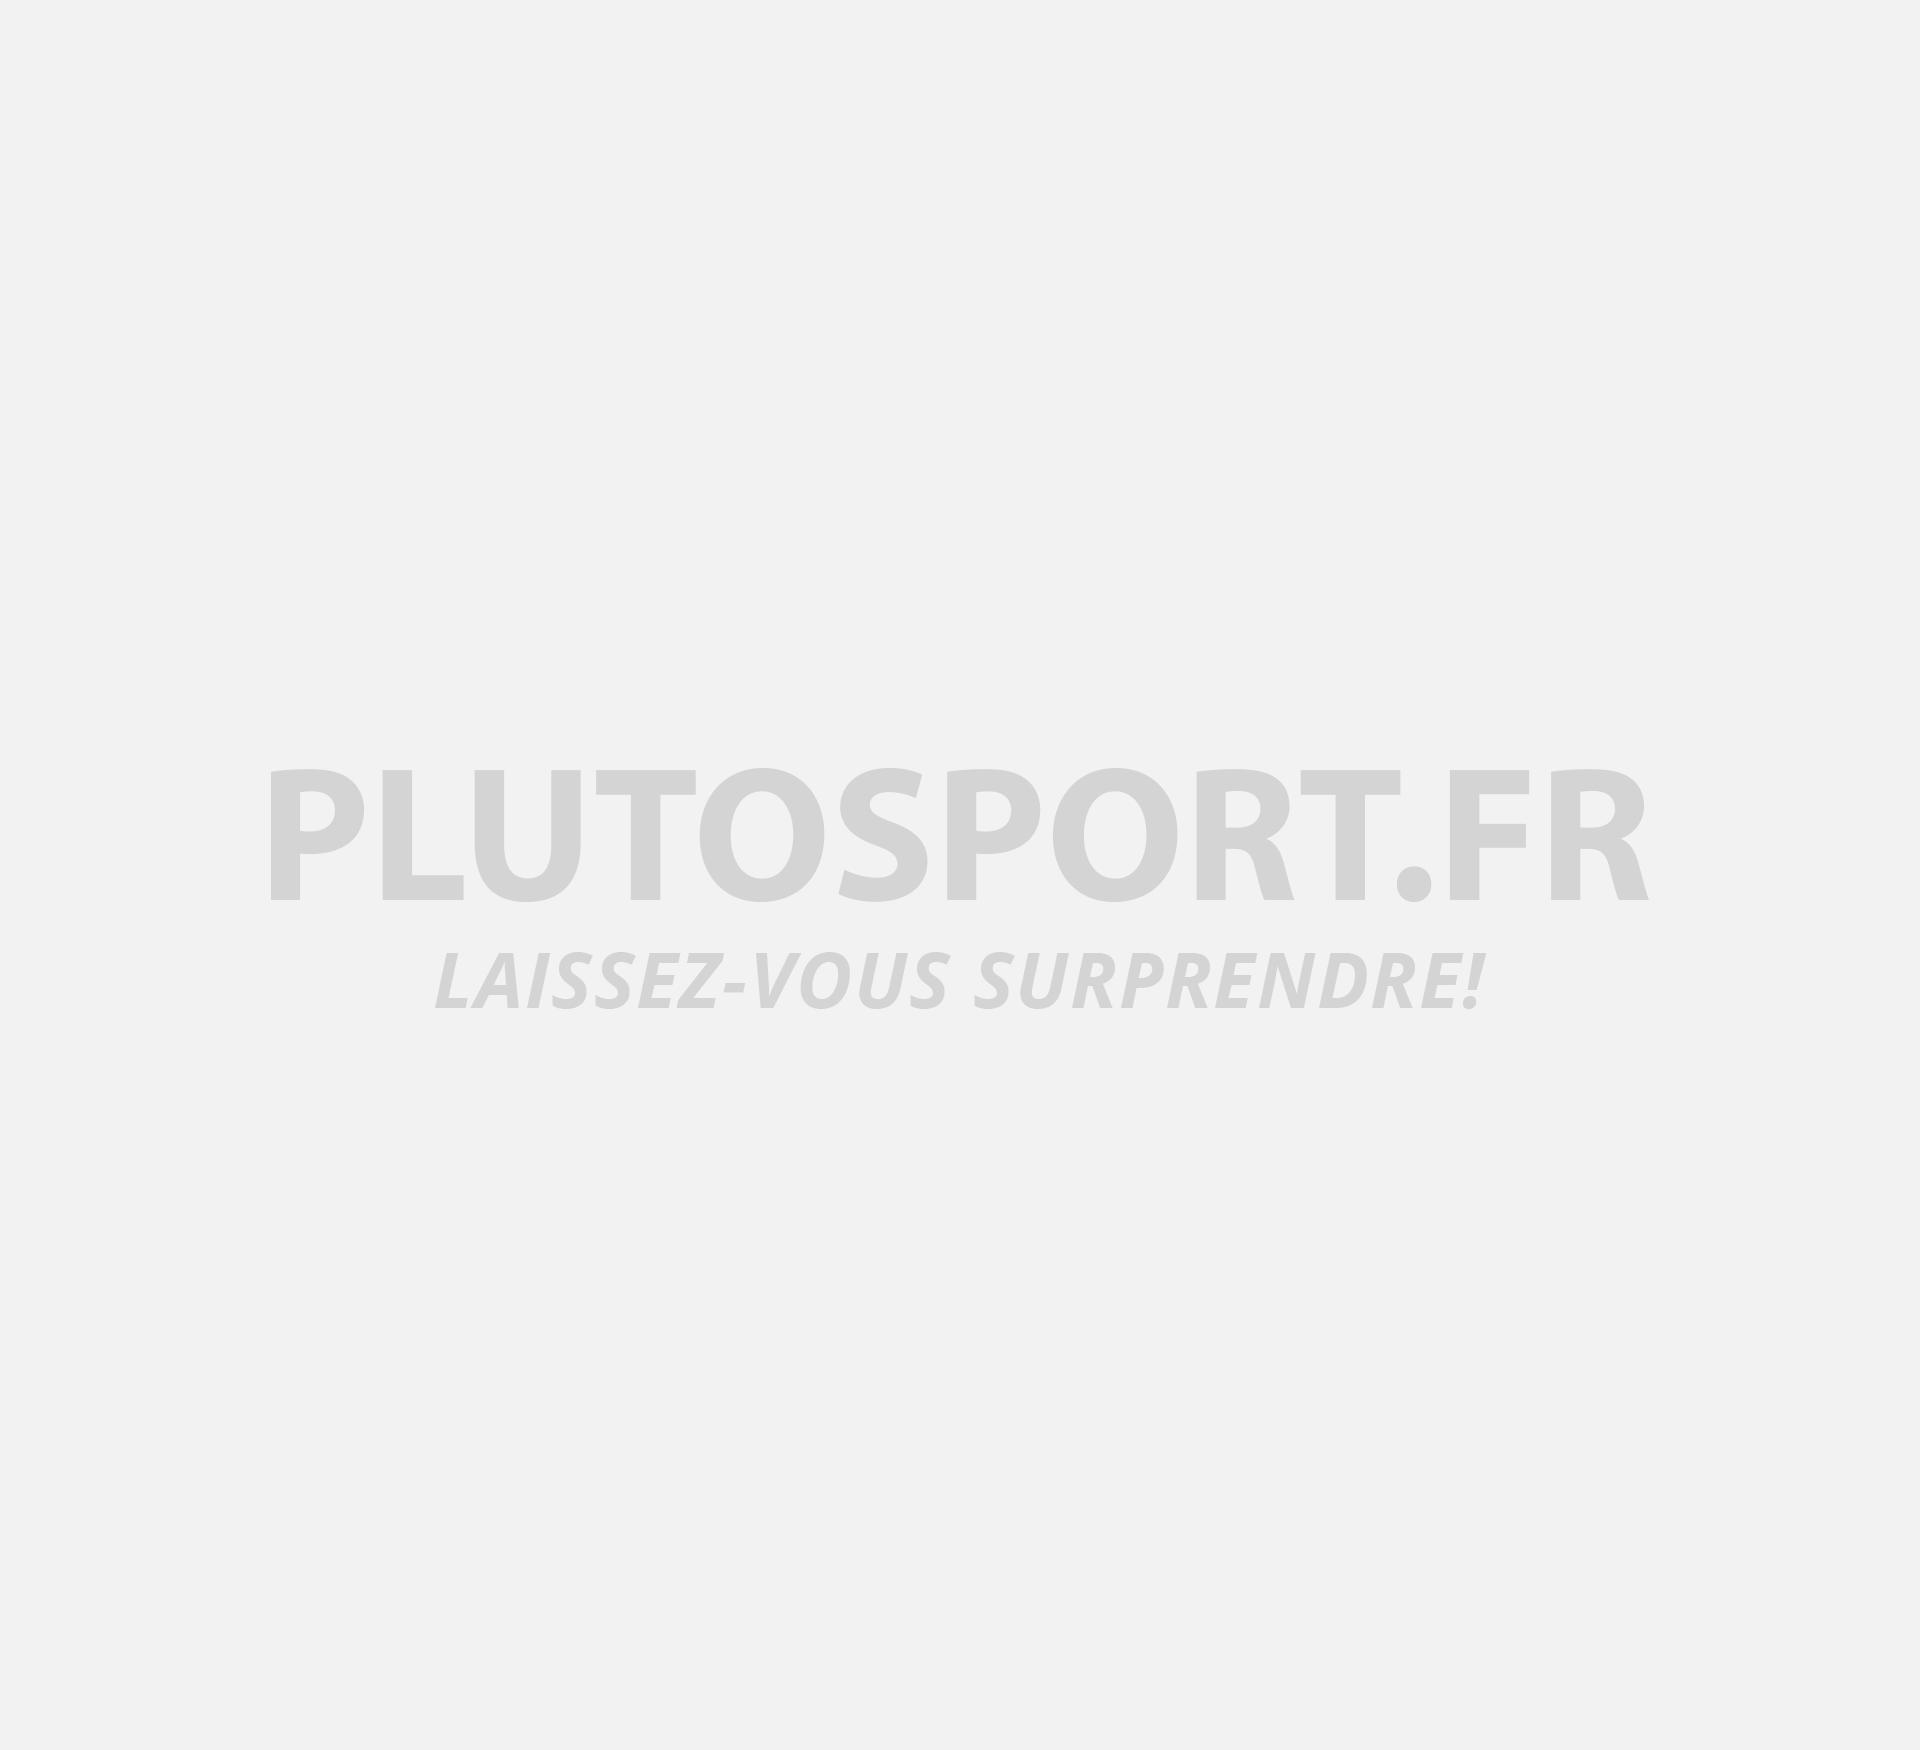 Calvin Klein Trunk Boxershorts Hommes (3-pack)